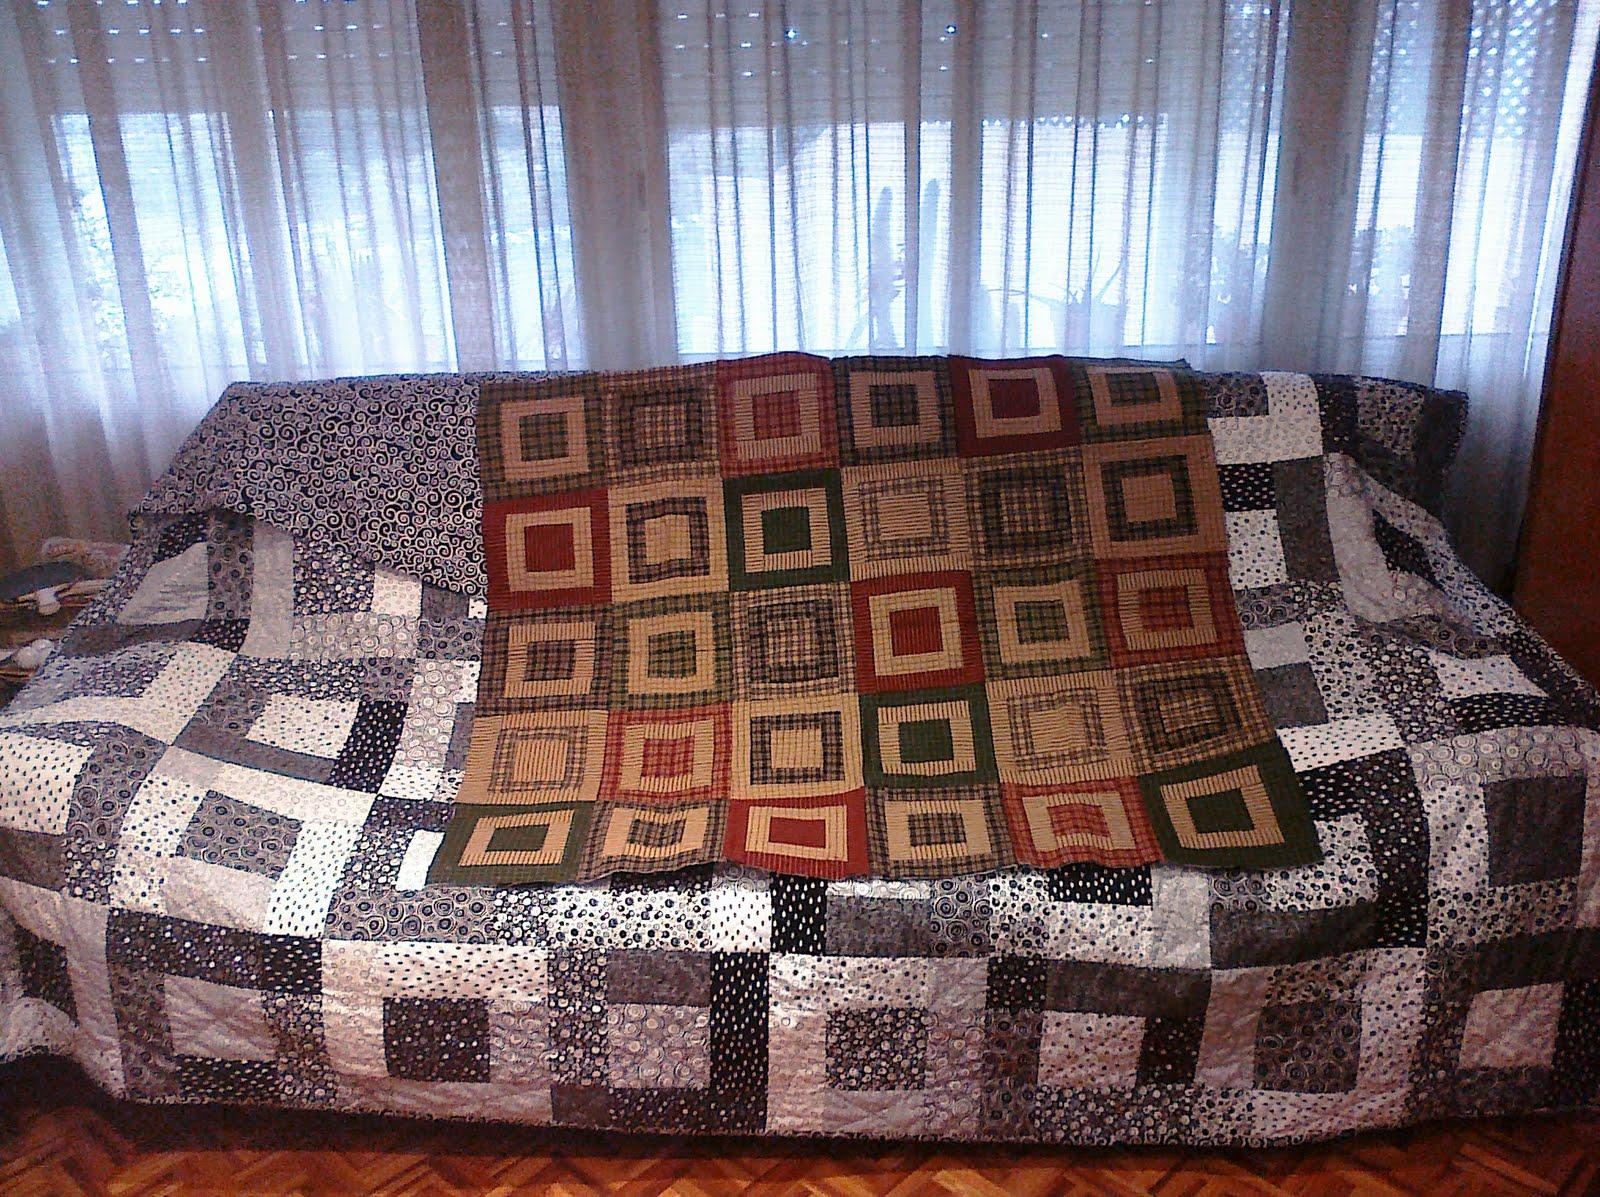 Concha nuevo trabajo o colcha o cubre sofa - Telas cubre sofas ...